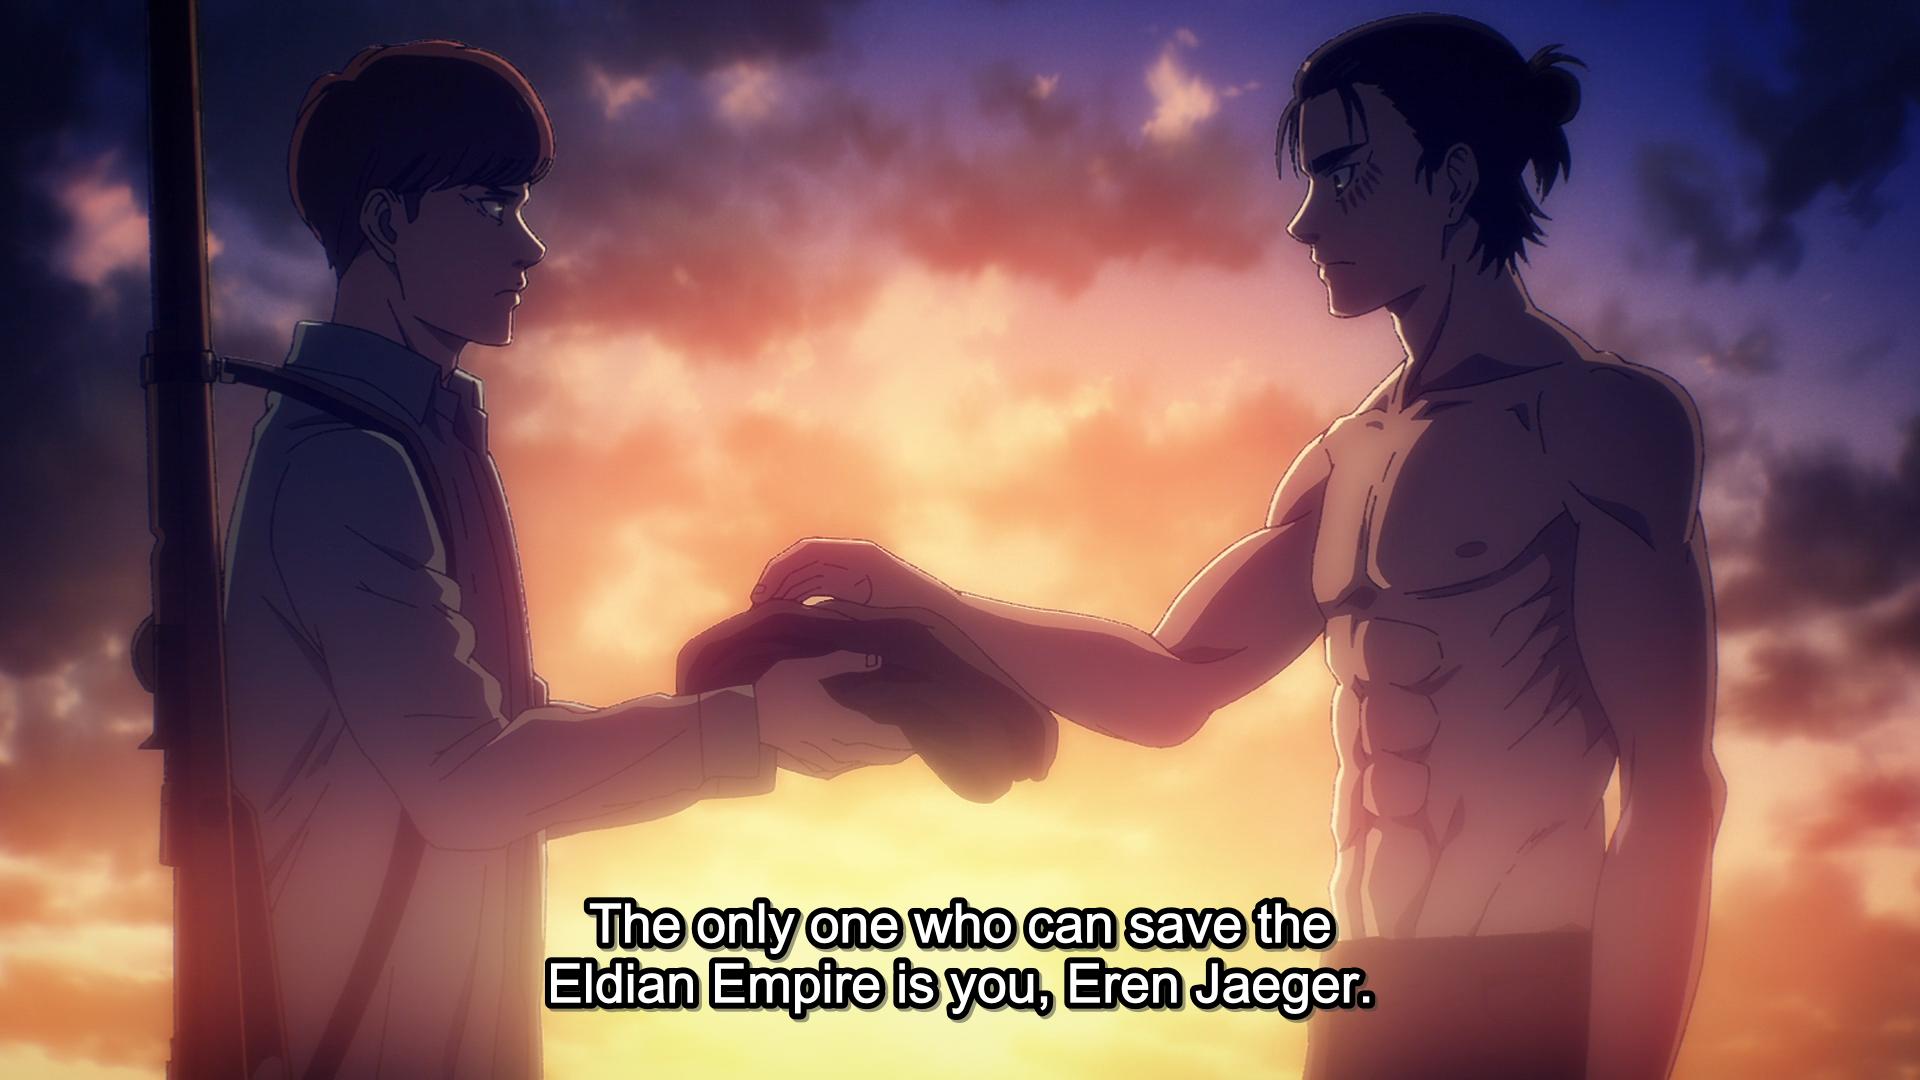 Attack on Titan Final Season - Eldian Empire